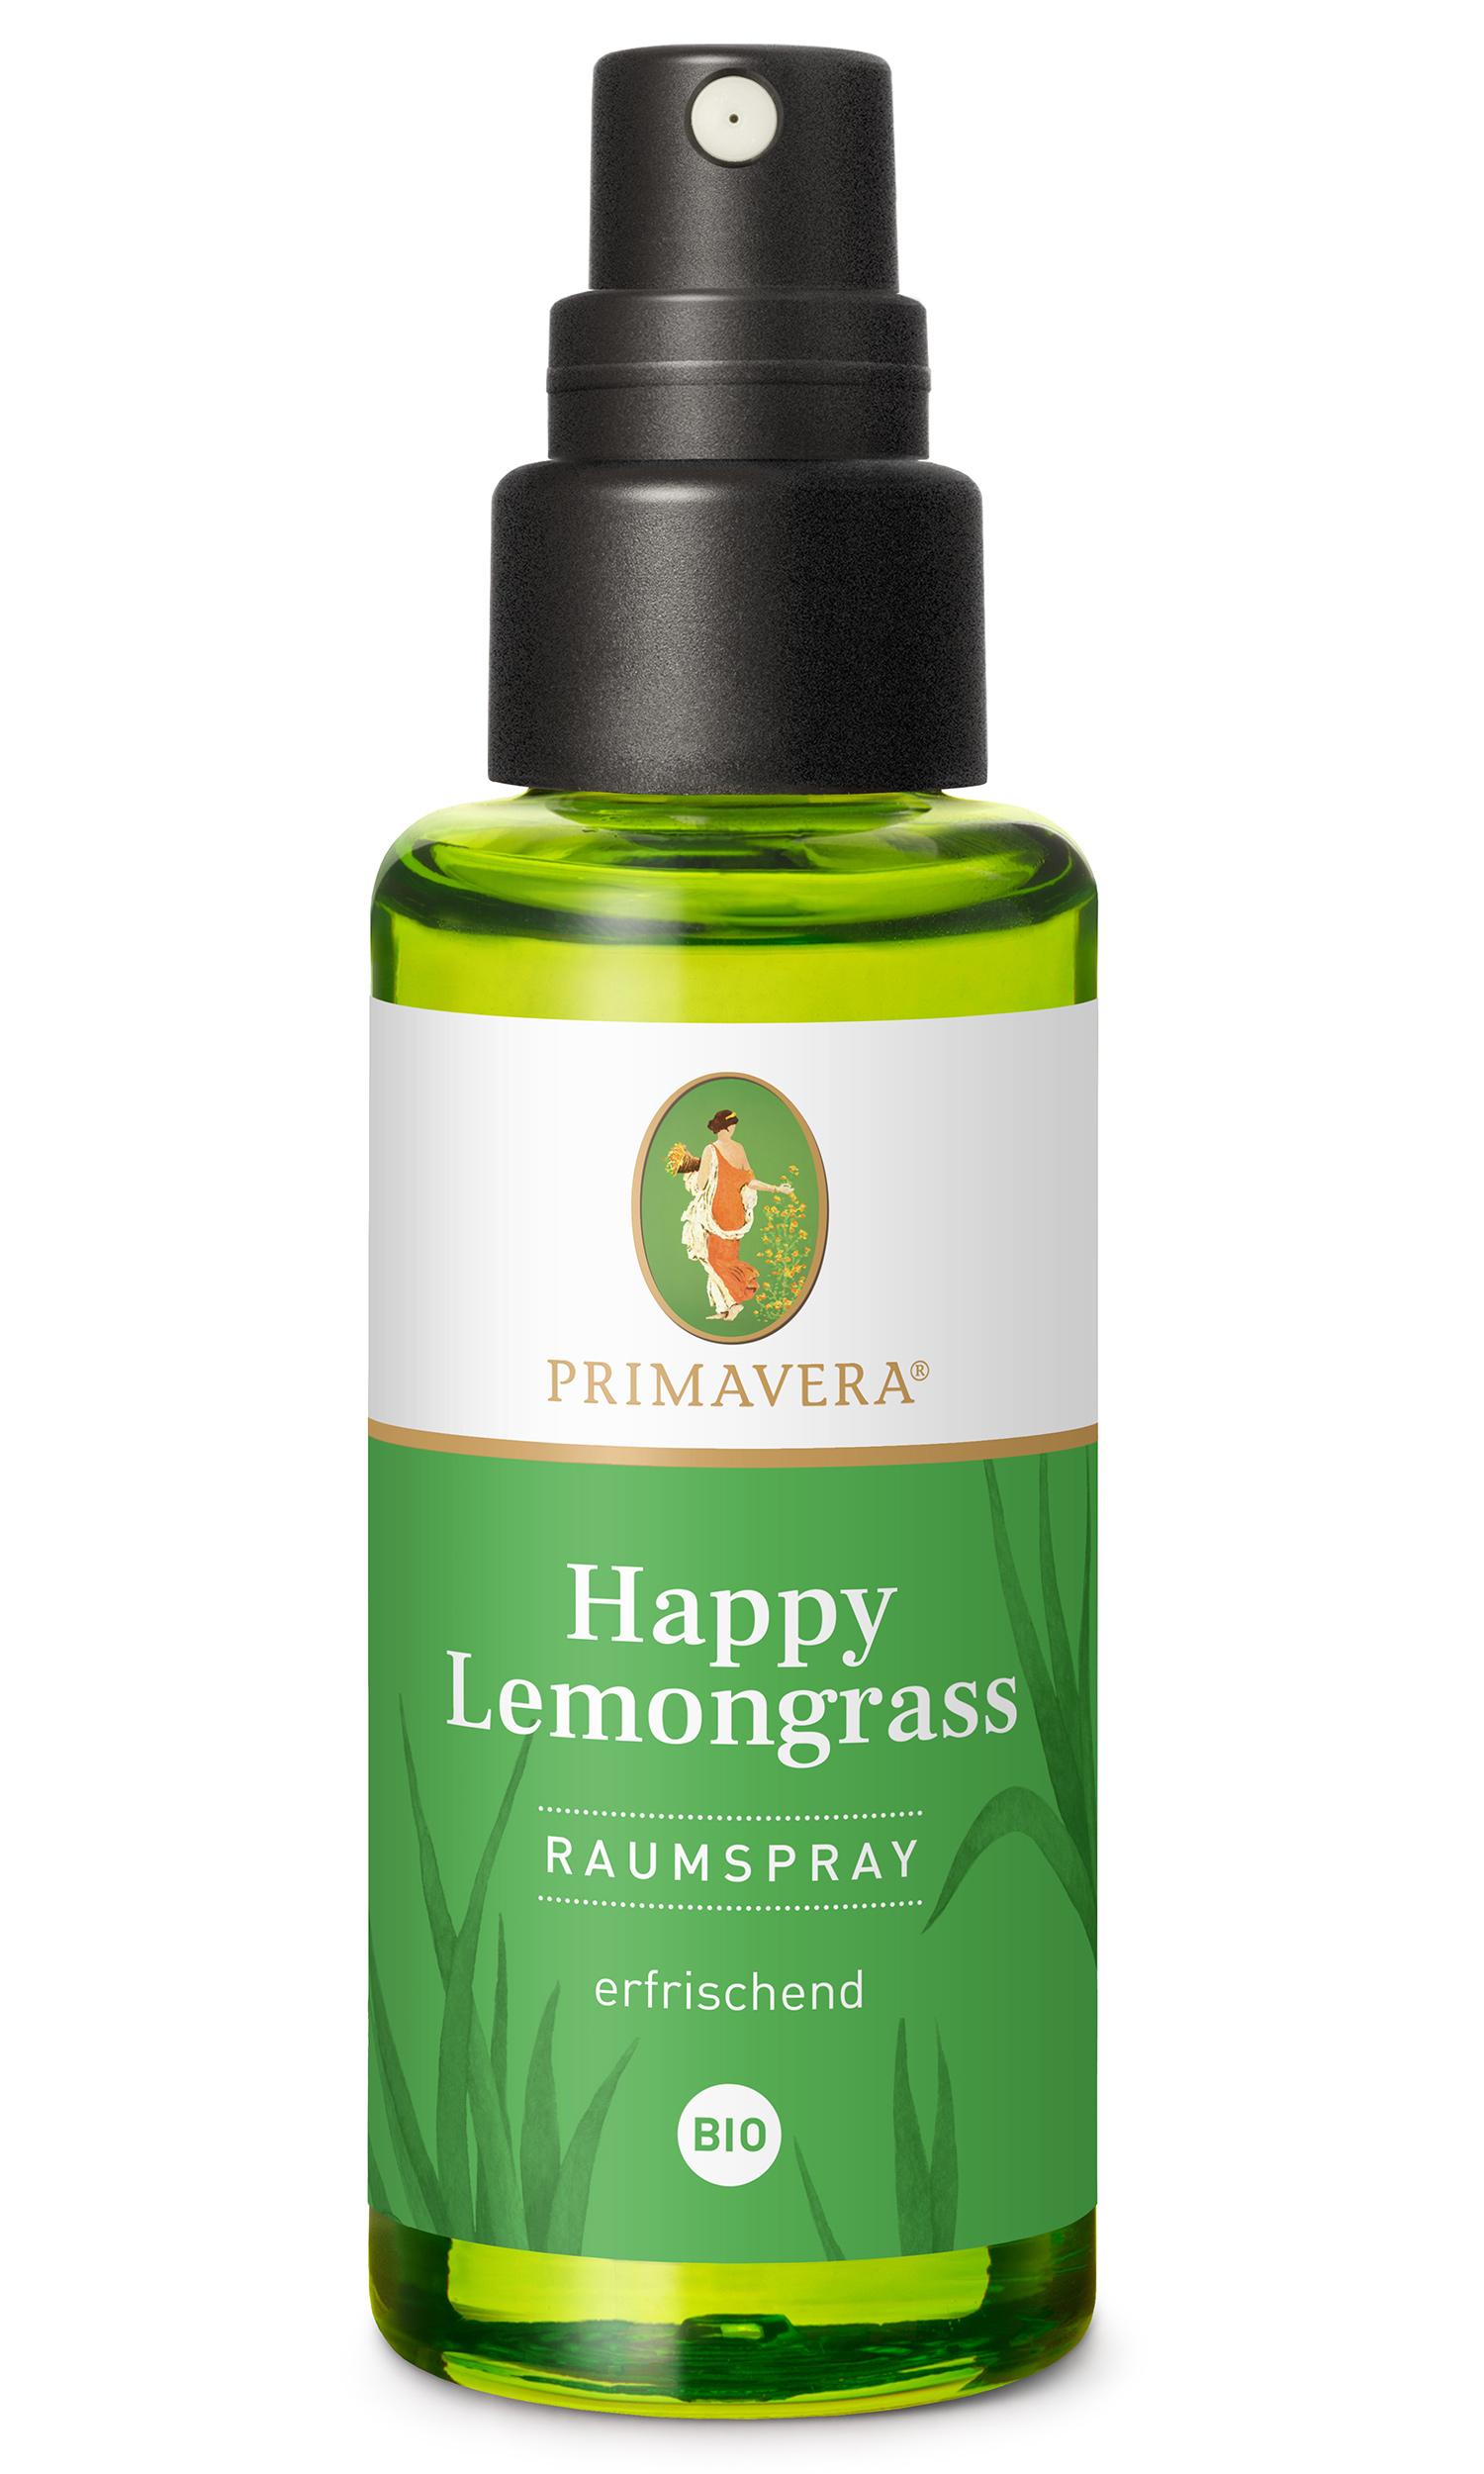 Bio Happy Lemongrass Raumspray, 50 ml